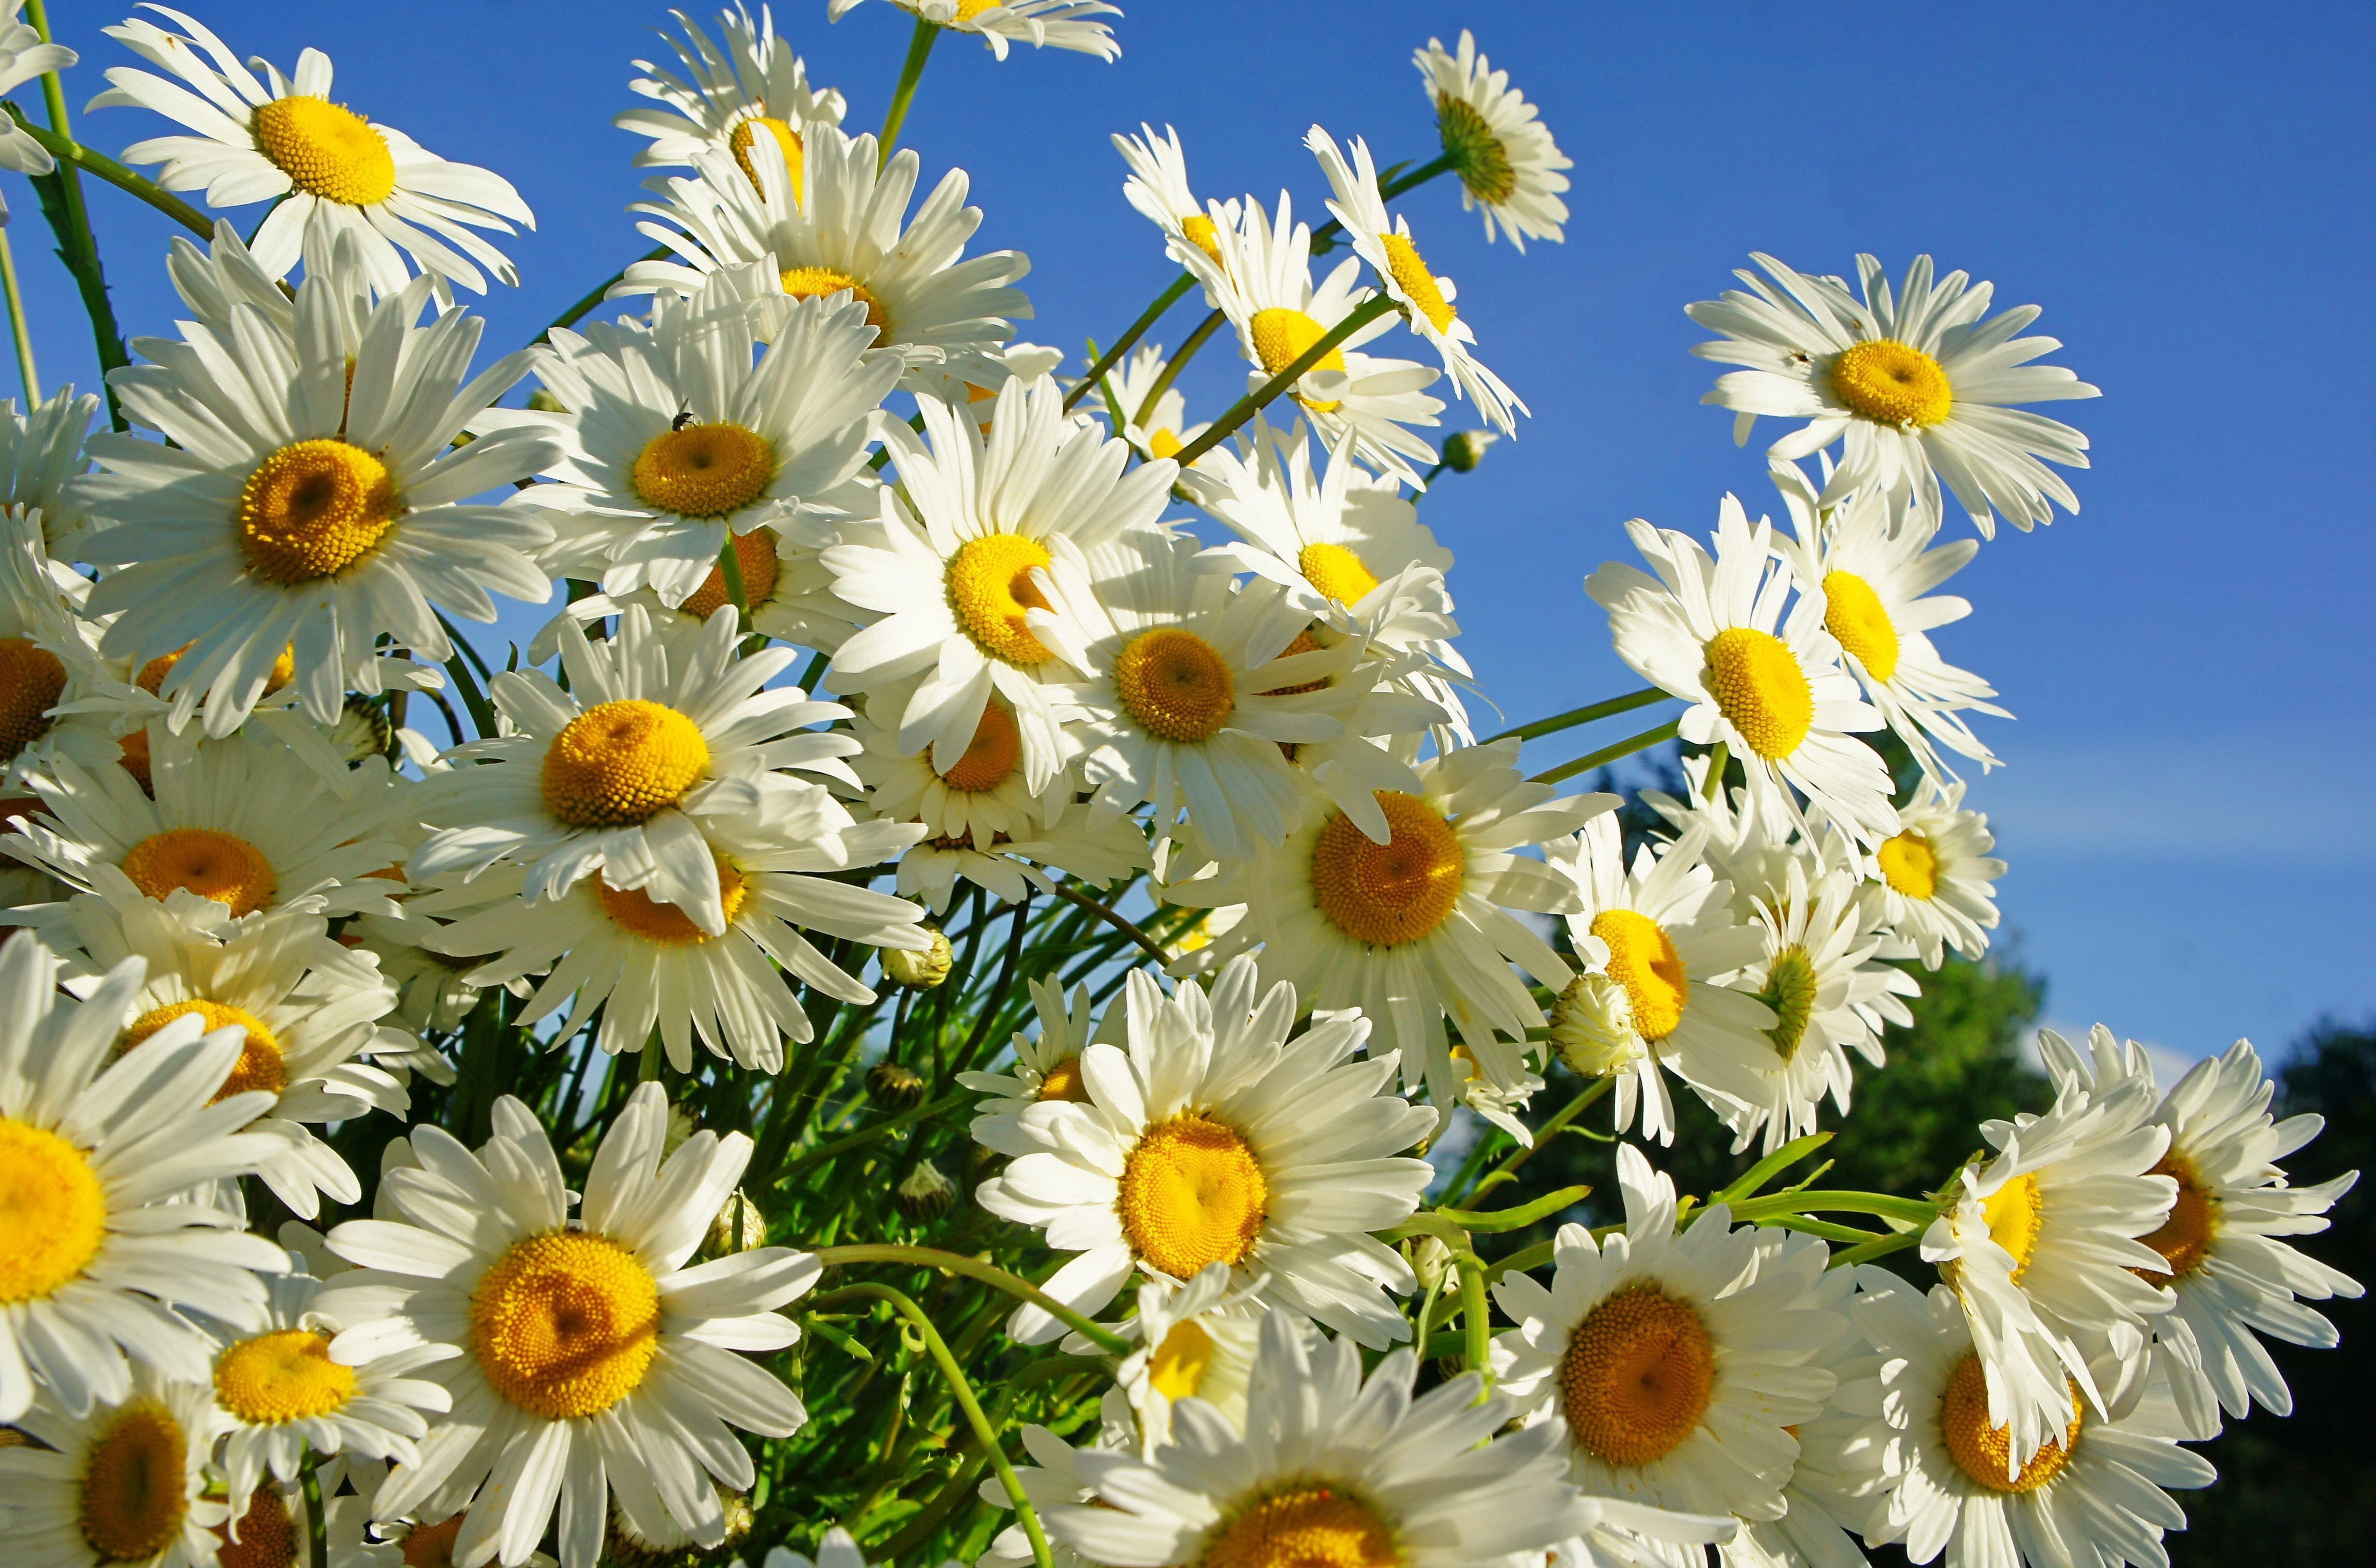 157148 Заставки и Обои Ромашки на телефон. Скачать Цветы, Ромашки, Букет, Небо, Солнечно, Лето картинки бесплатно